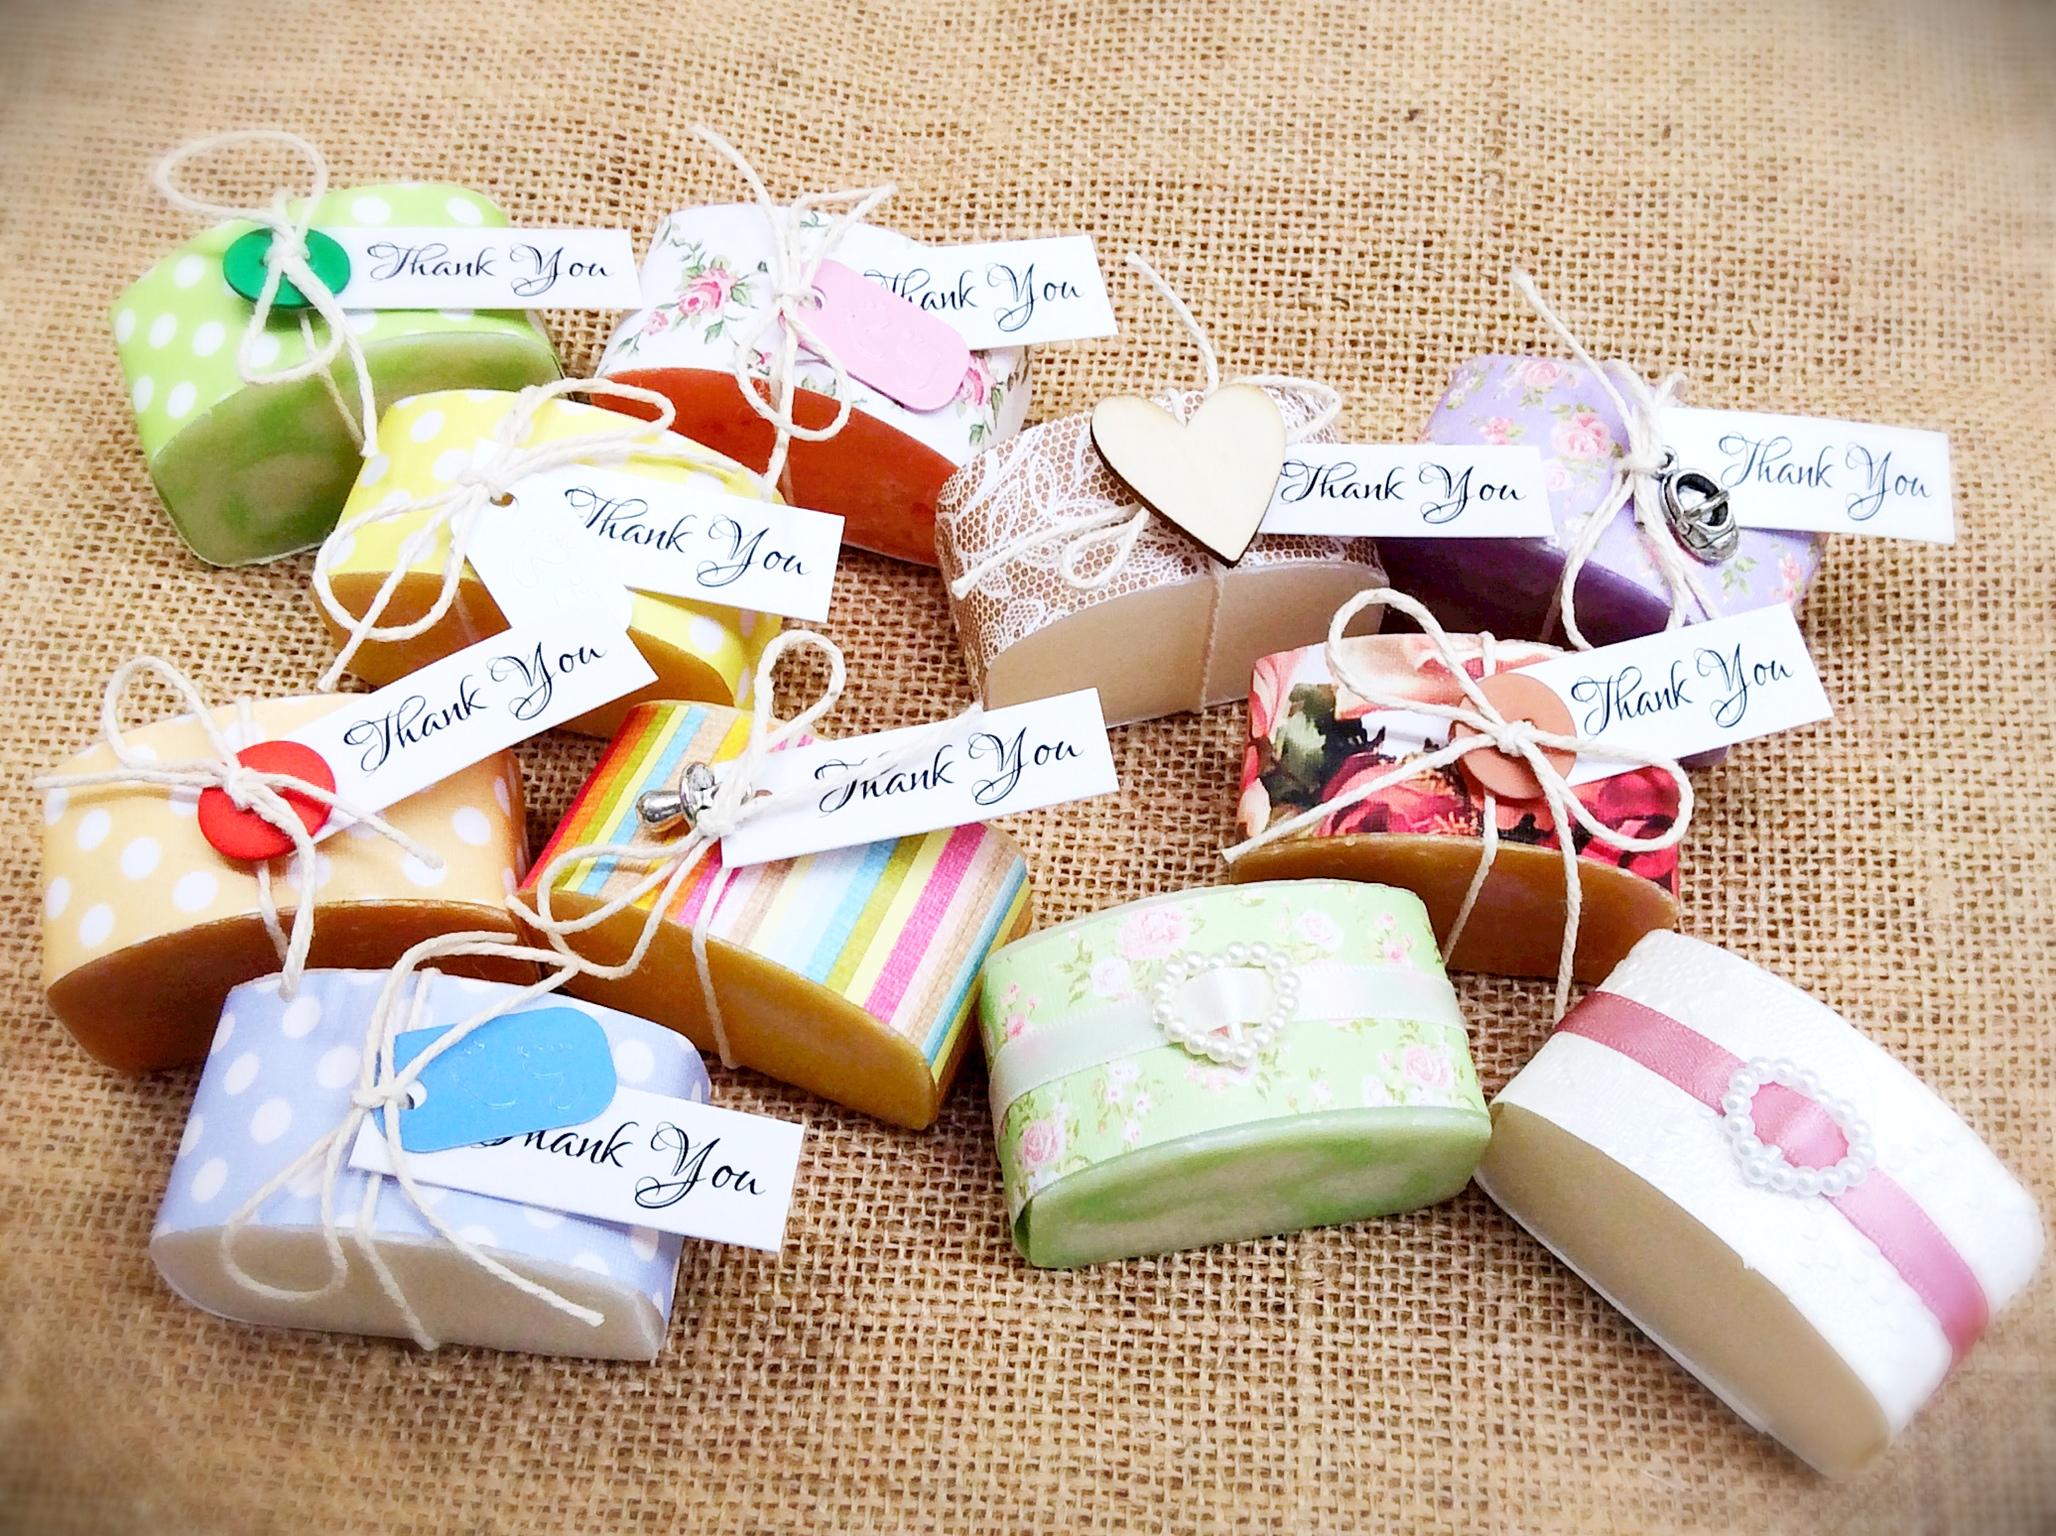 2-mini-soap-group-photo.jpg